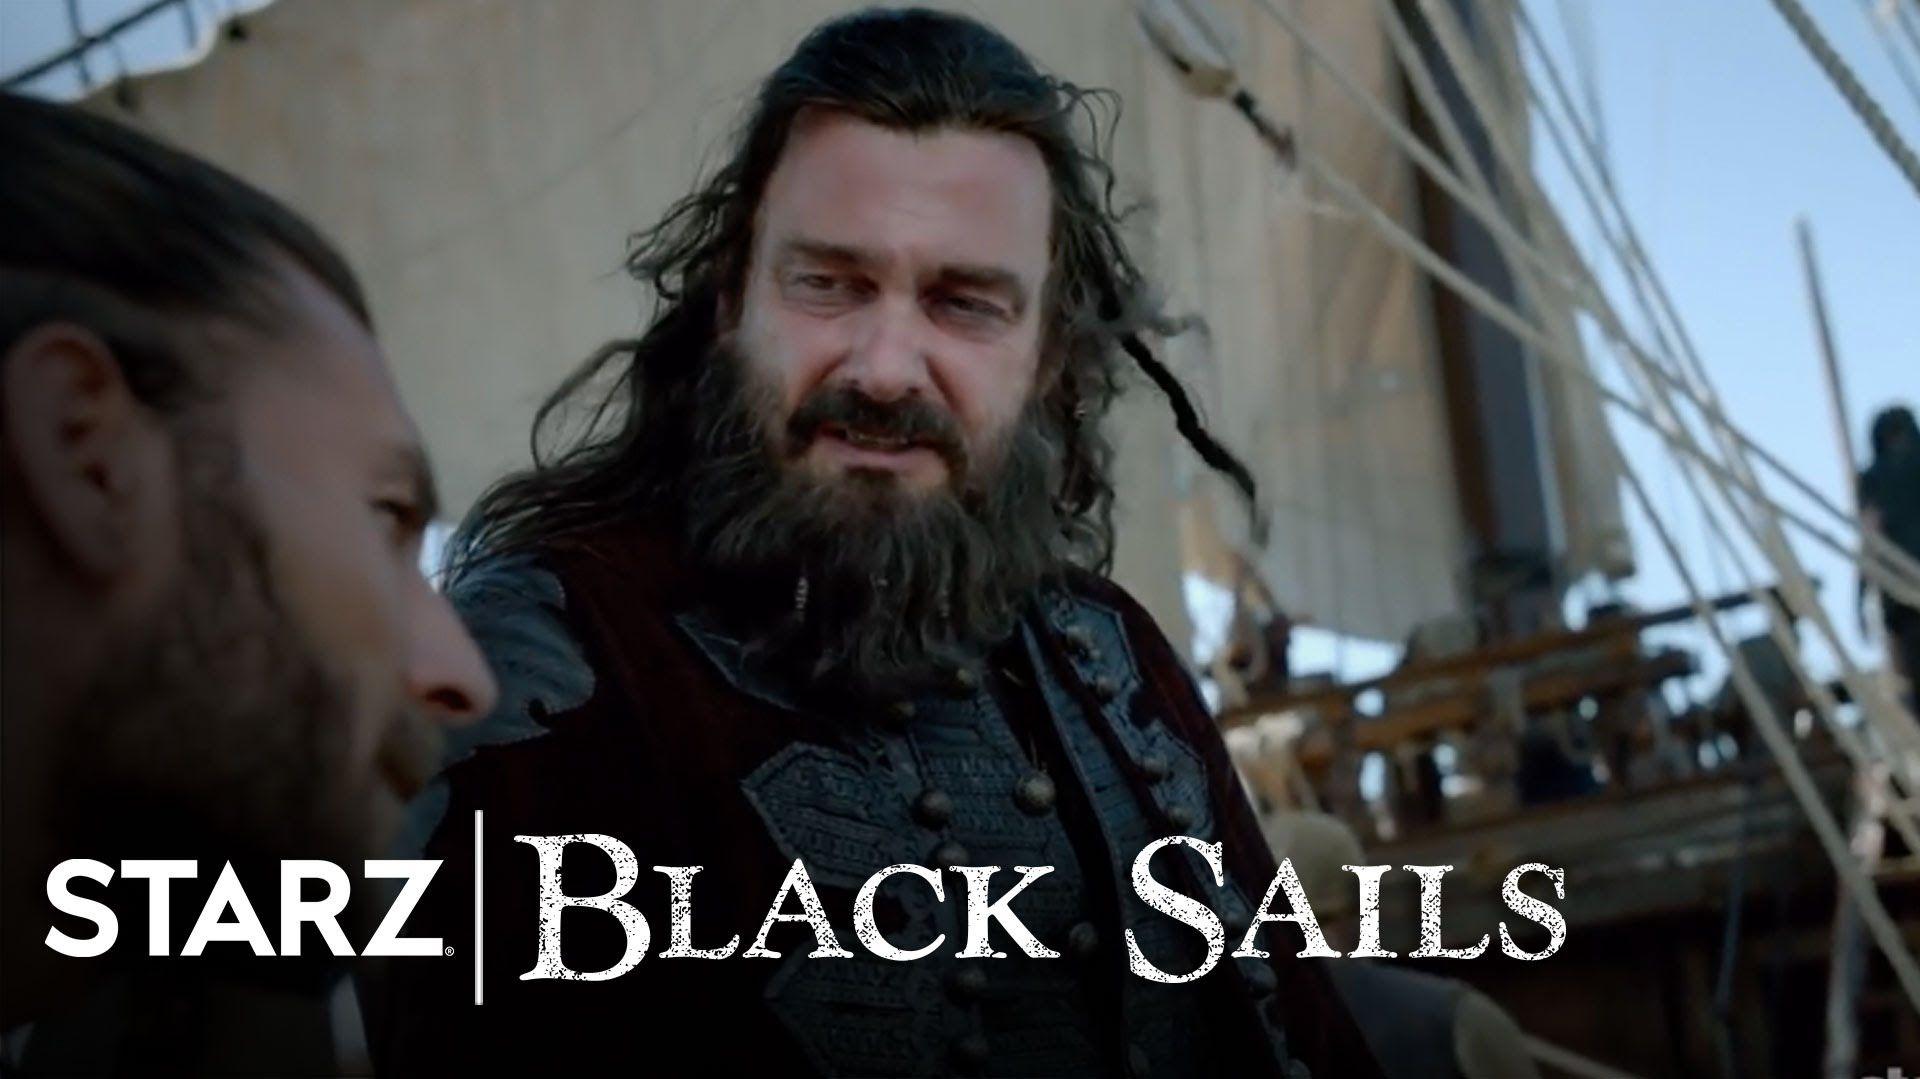 Black Sails   Ep. 305 Clip: The Lion Has No Den   STARZ. I LOVE Ray Stevenson and Zach McGowan's voices!!! <3